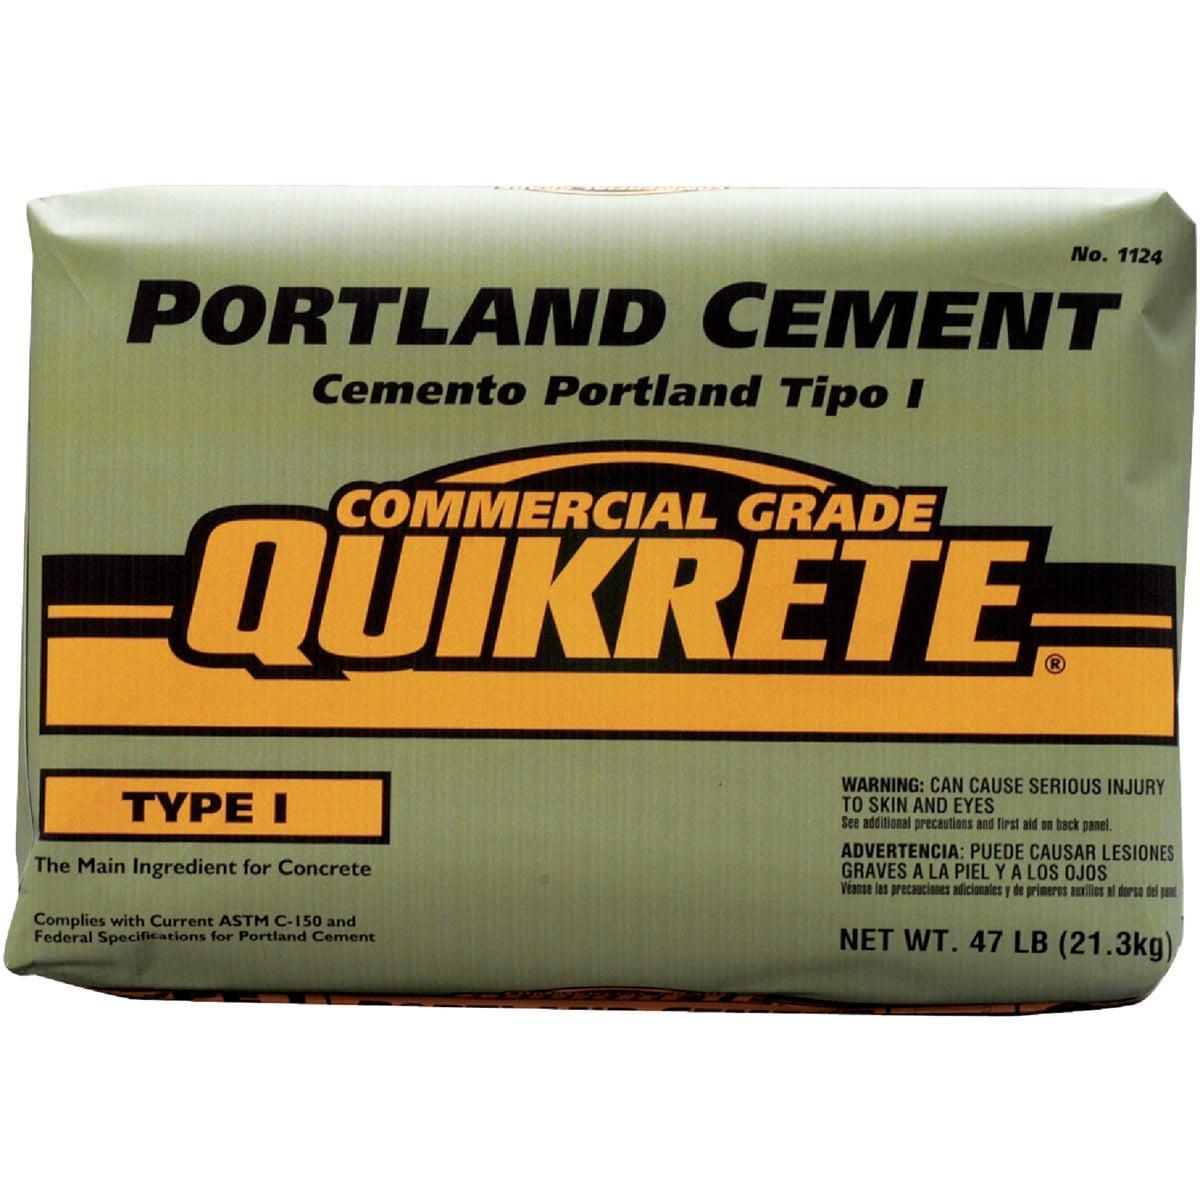 Quikrete Portland Cement Type I, 1124-47